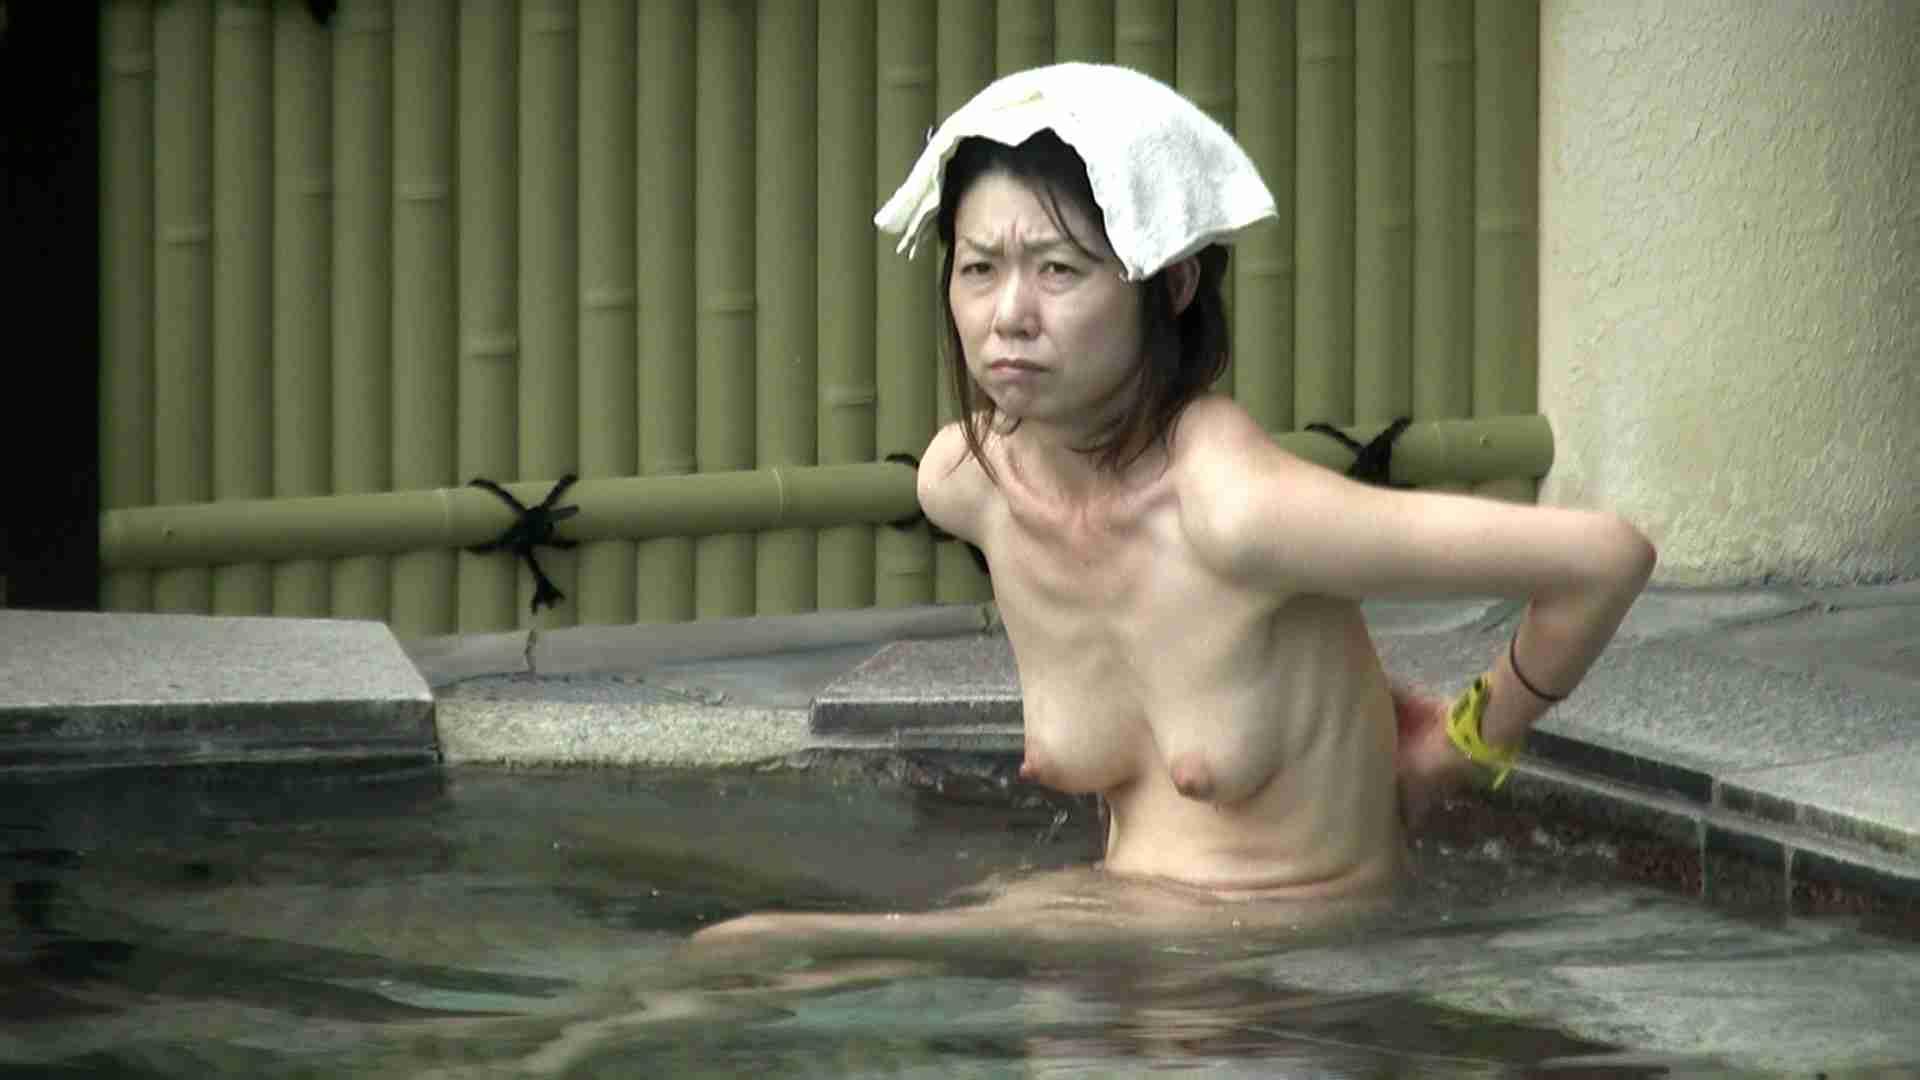 Aquaな露天風呂Vol.658 OLのエロ生活 | 露天風呂  30連発 4